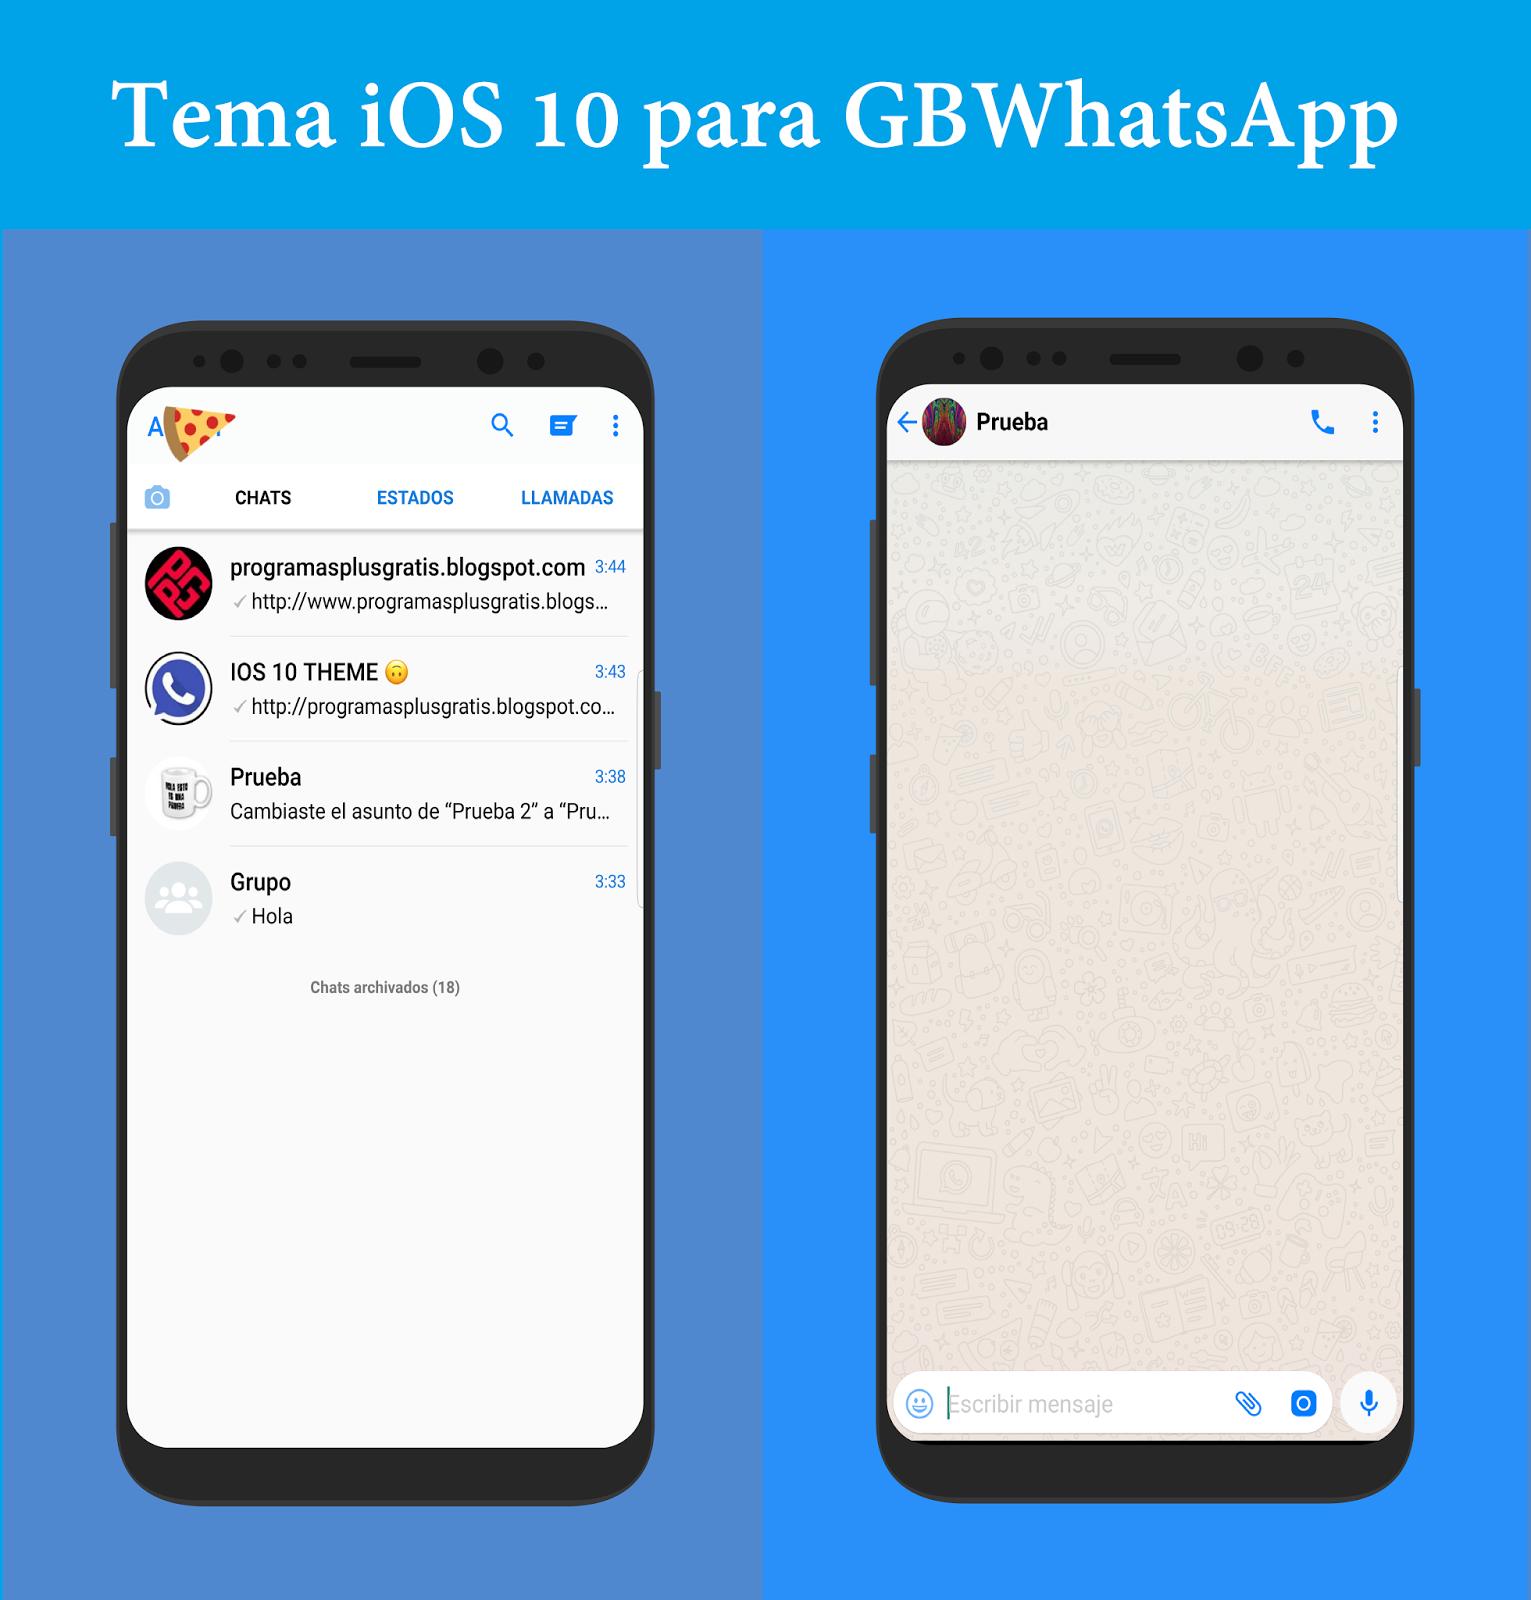 gbwhatsapp gratuit pour iphone